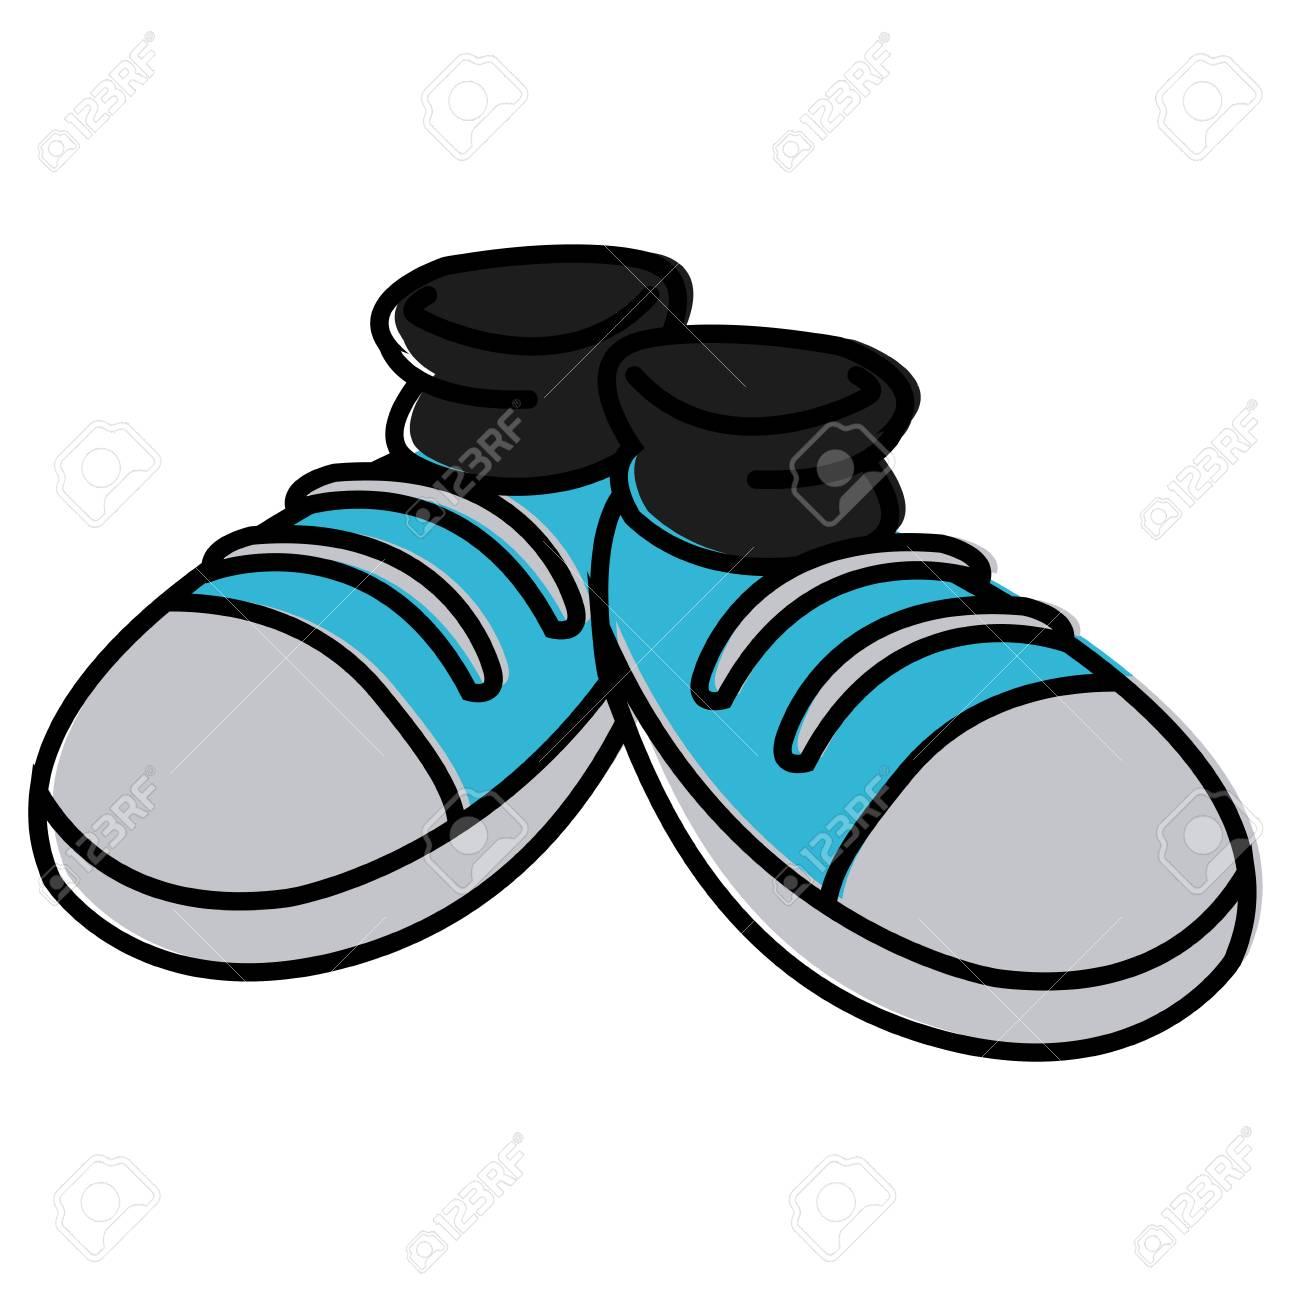 e648ec54d8aa Pair of shoes cartoon icon vector illustration graphic design Stock Vector  - 94217874